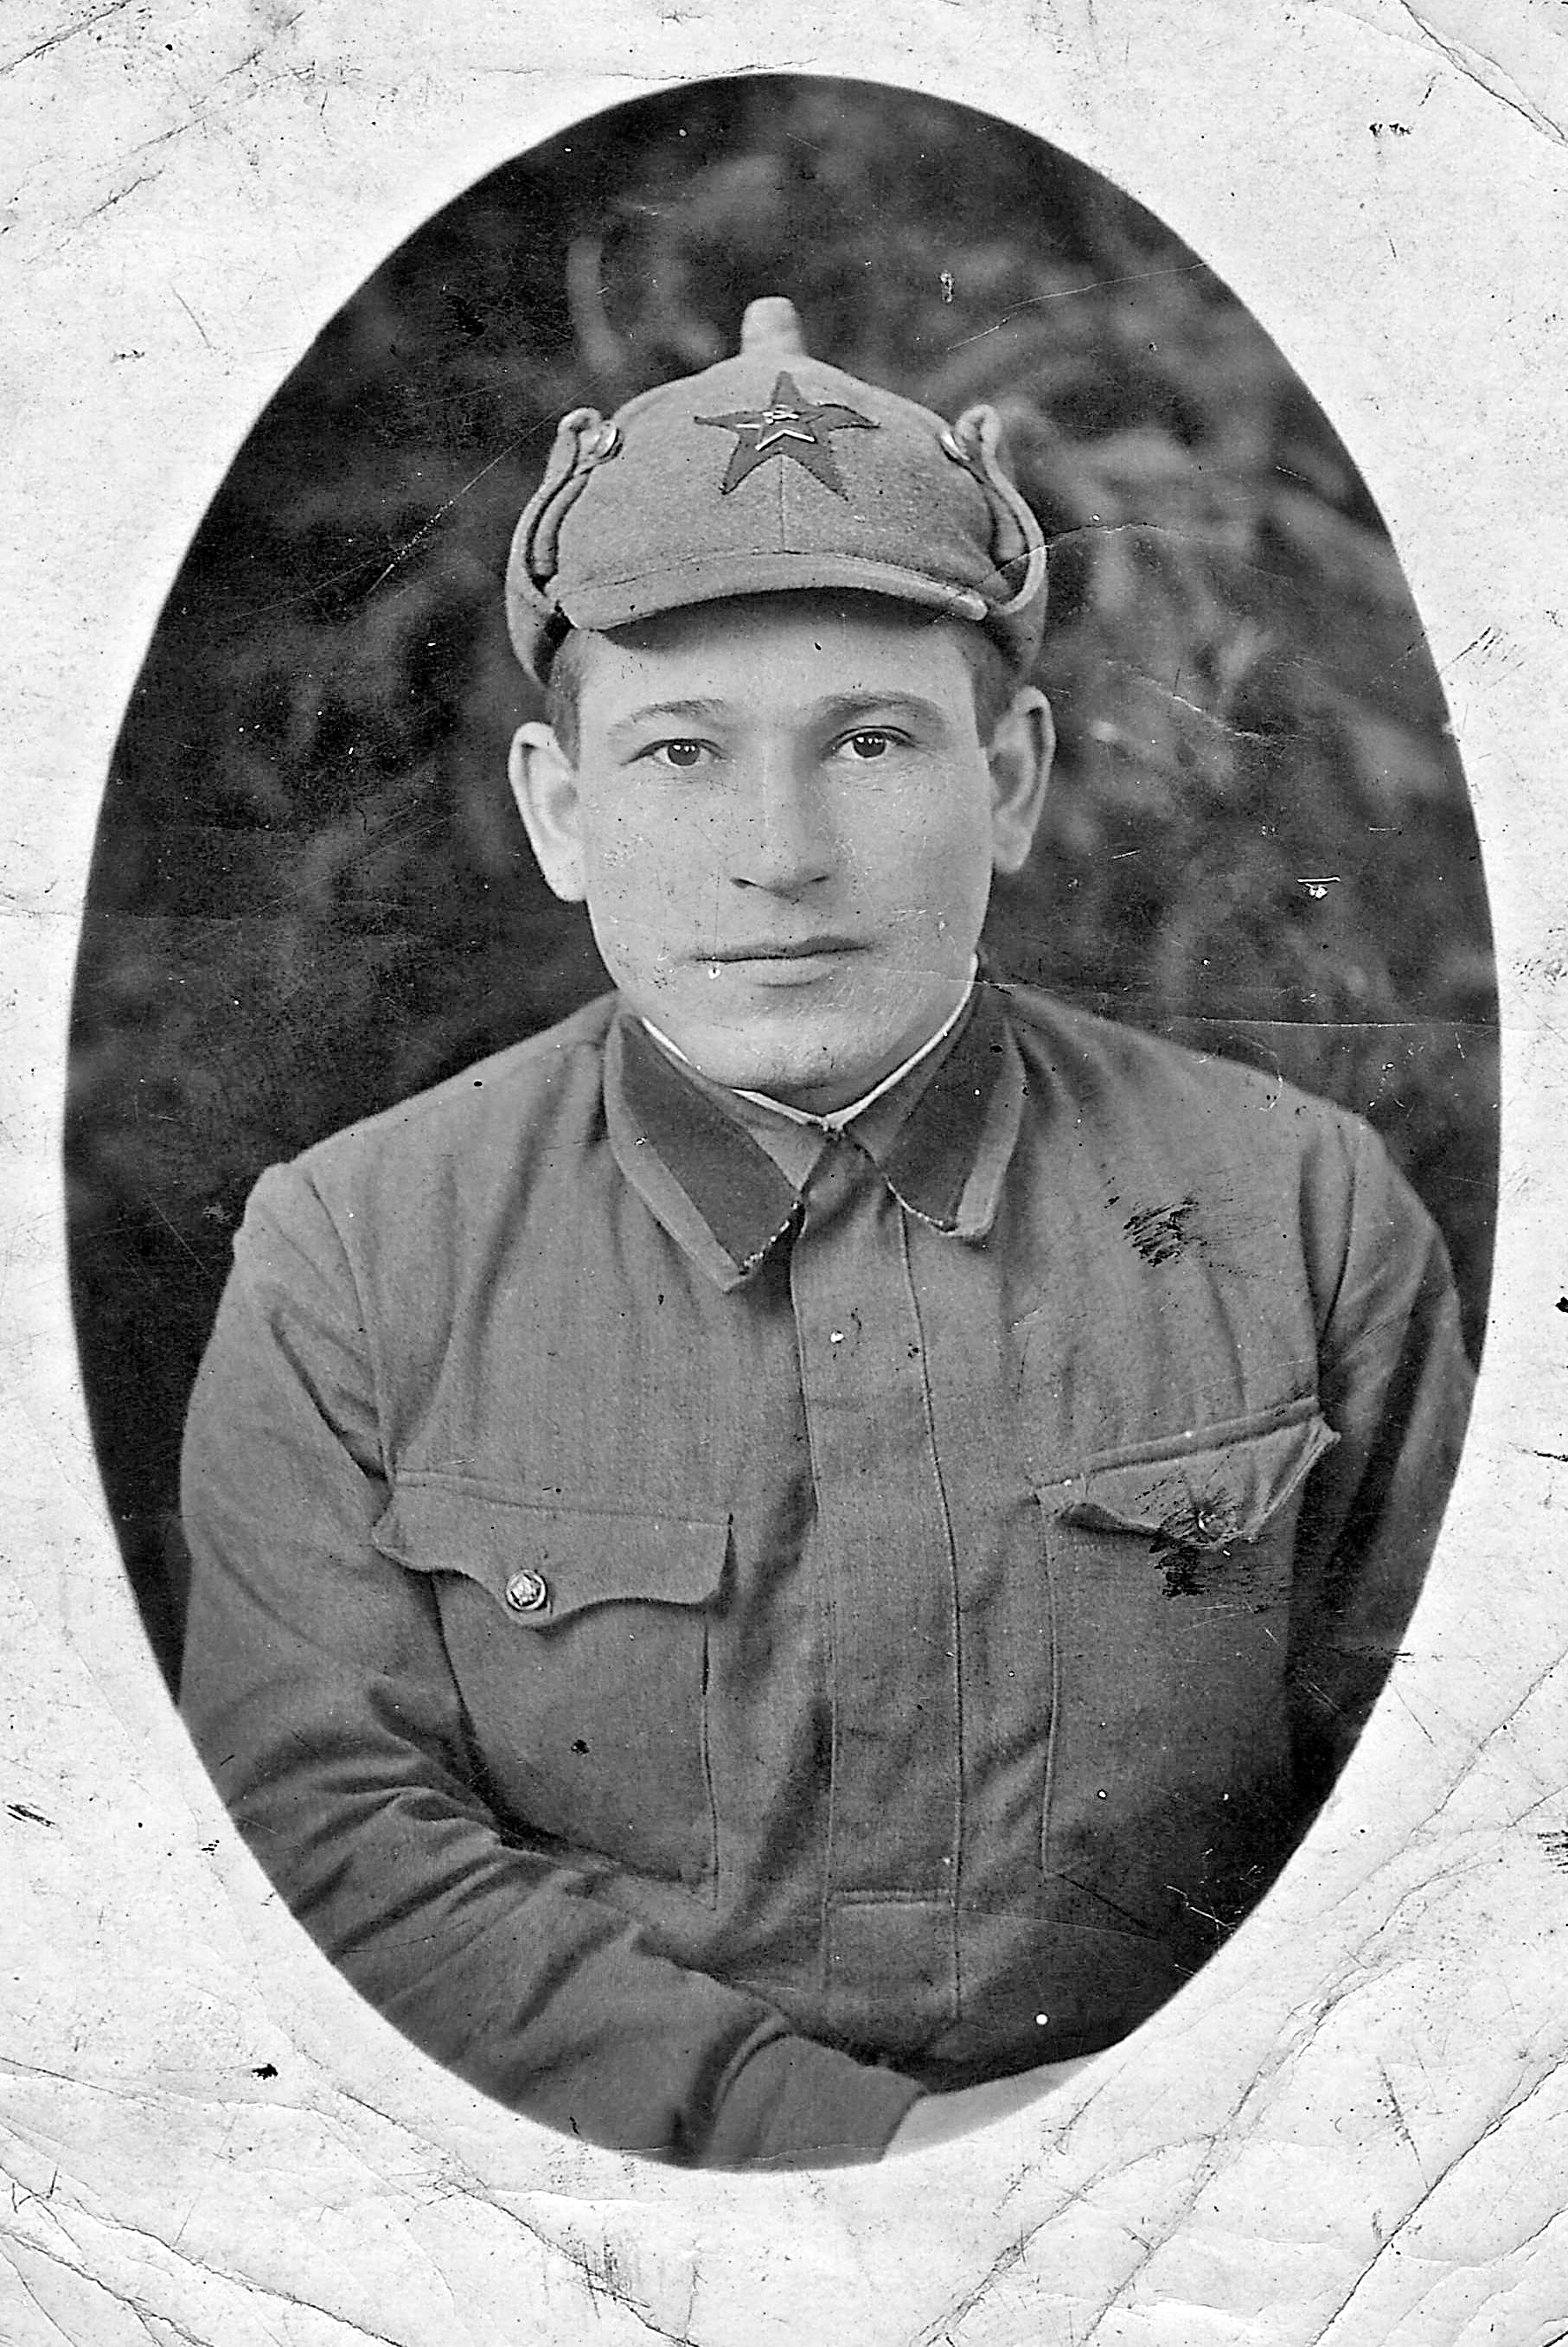 Добрецов А.Ф. фото 1941 года из семейного архива внука Добрецова А.Ю.